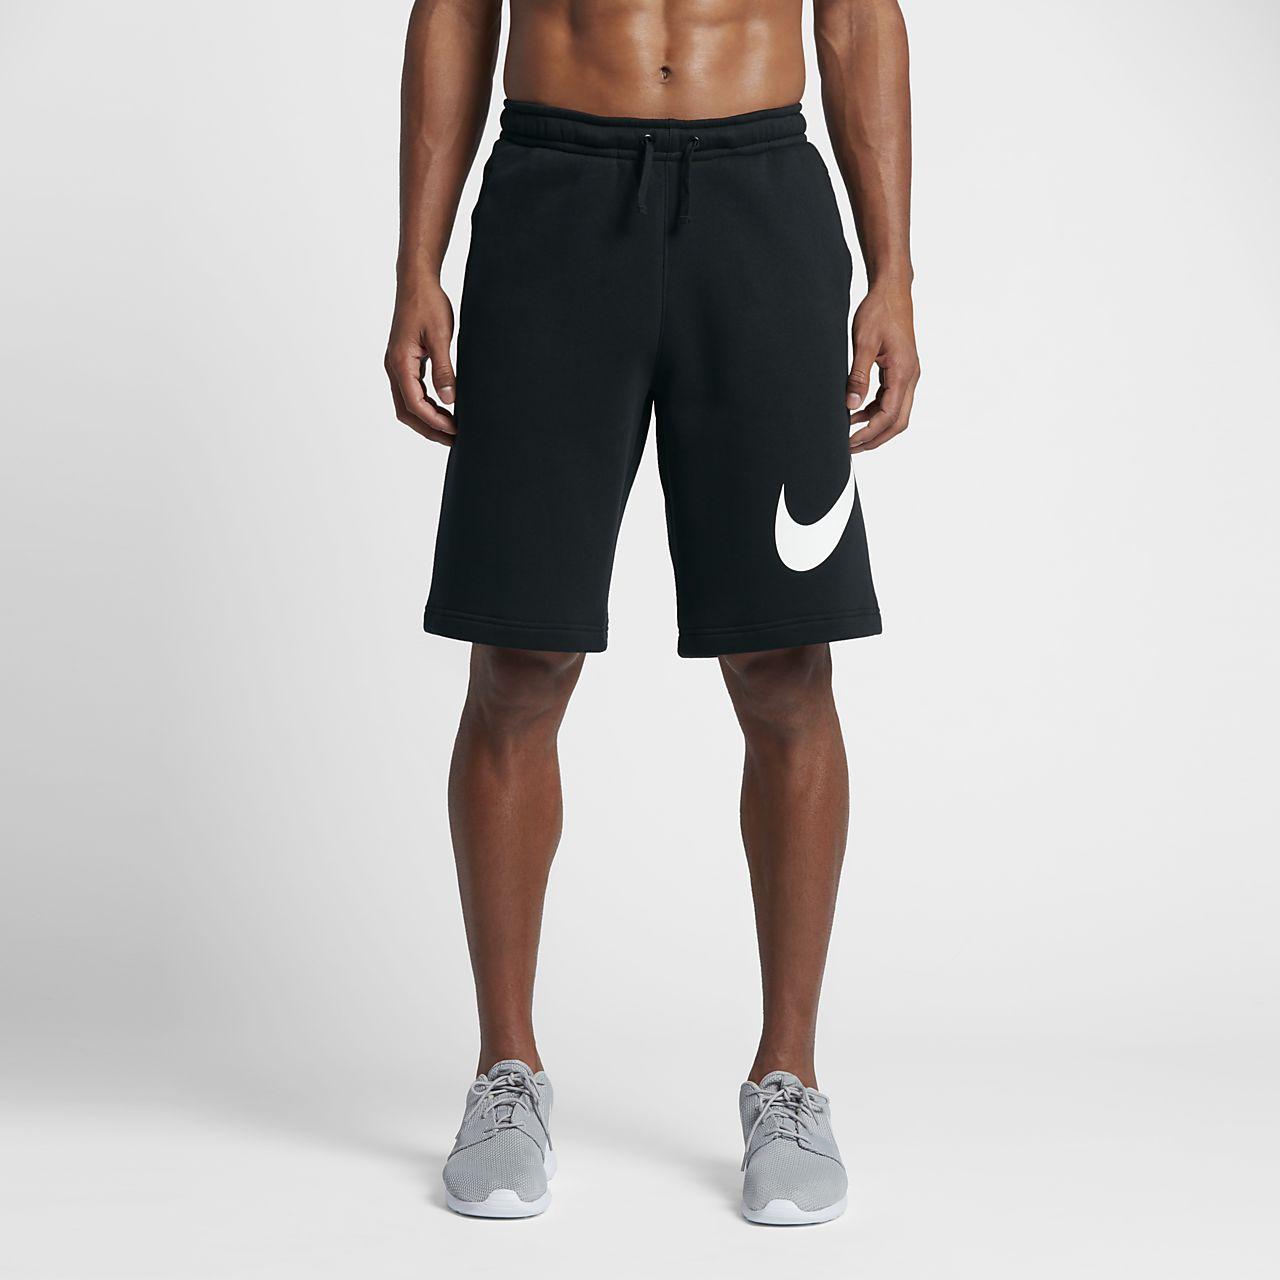 2738945626e6 Nike Sportswear Club Fleece Men s Shorts. Nike.com